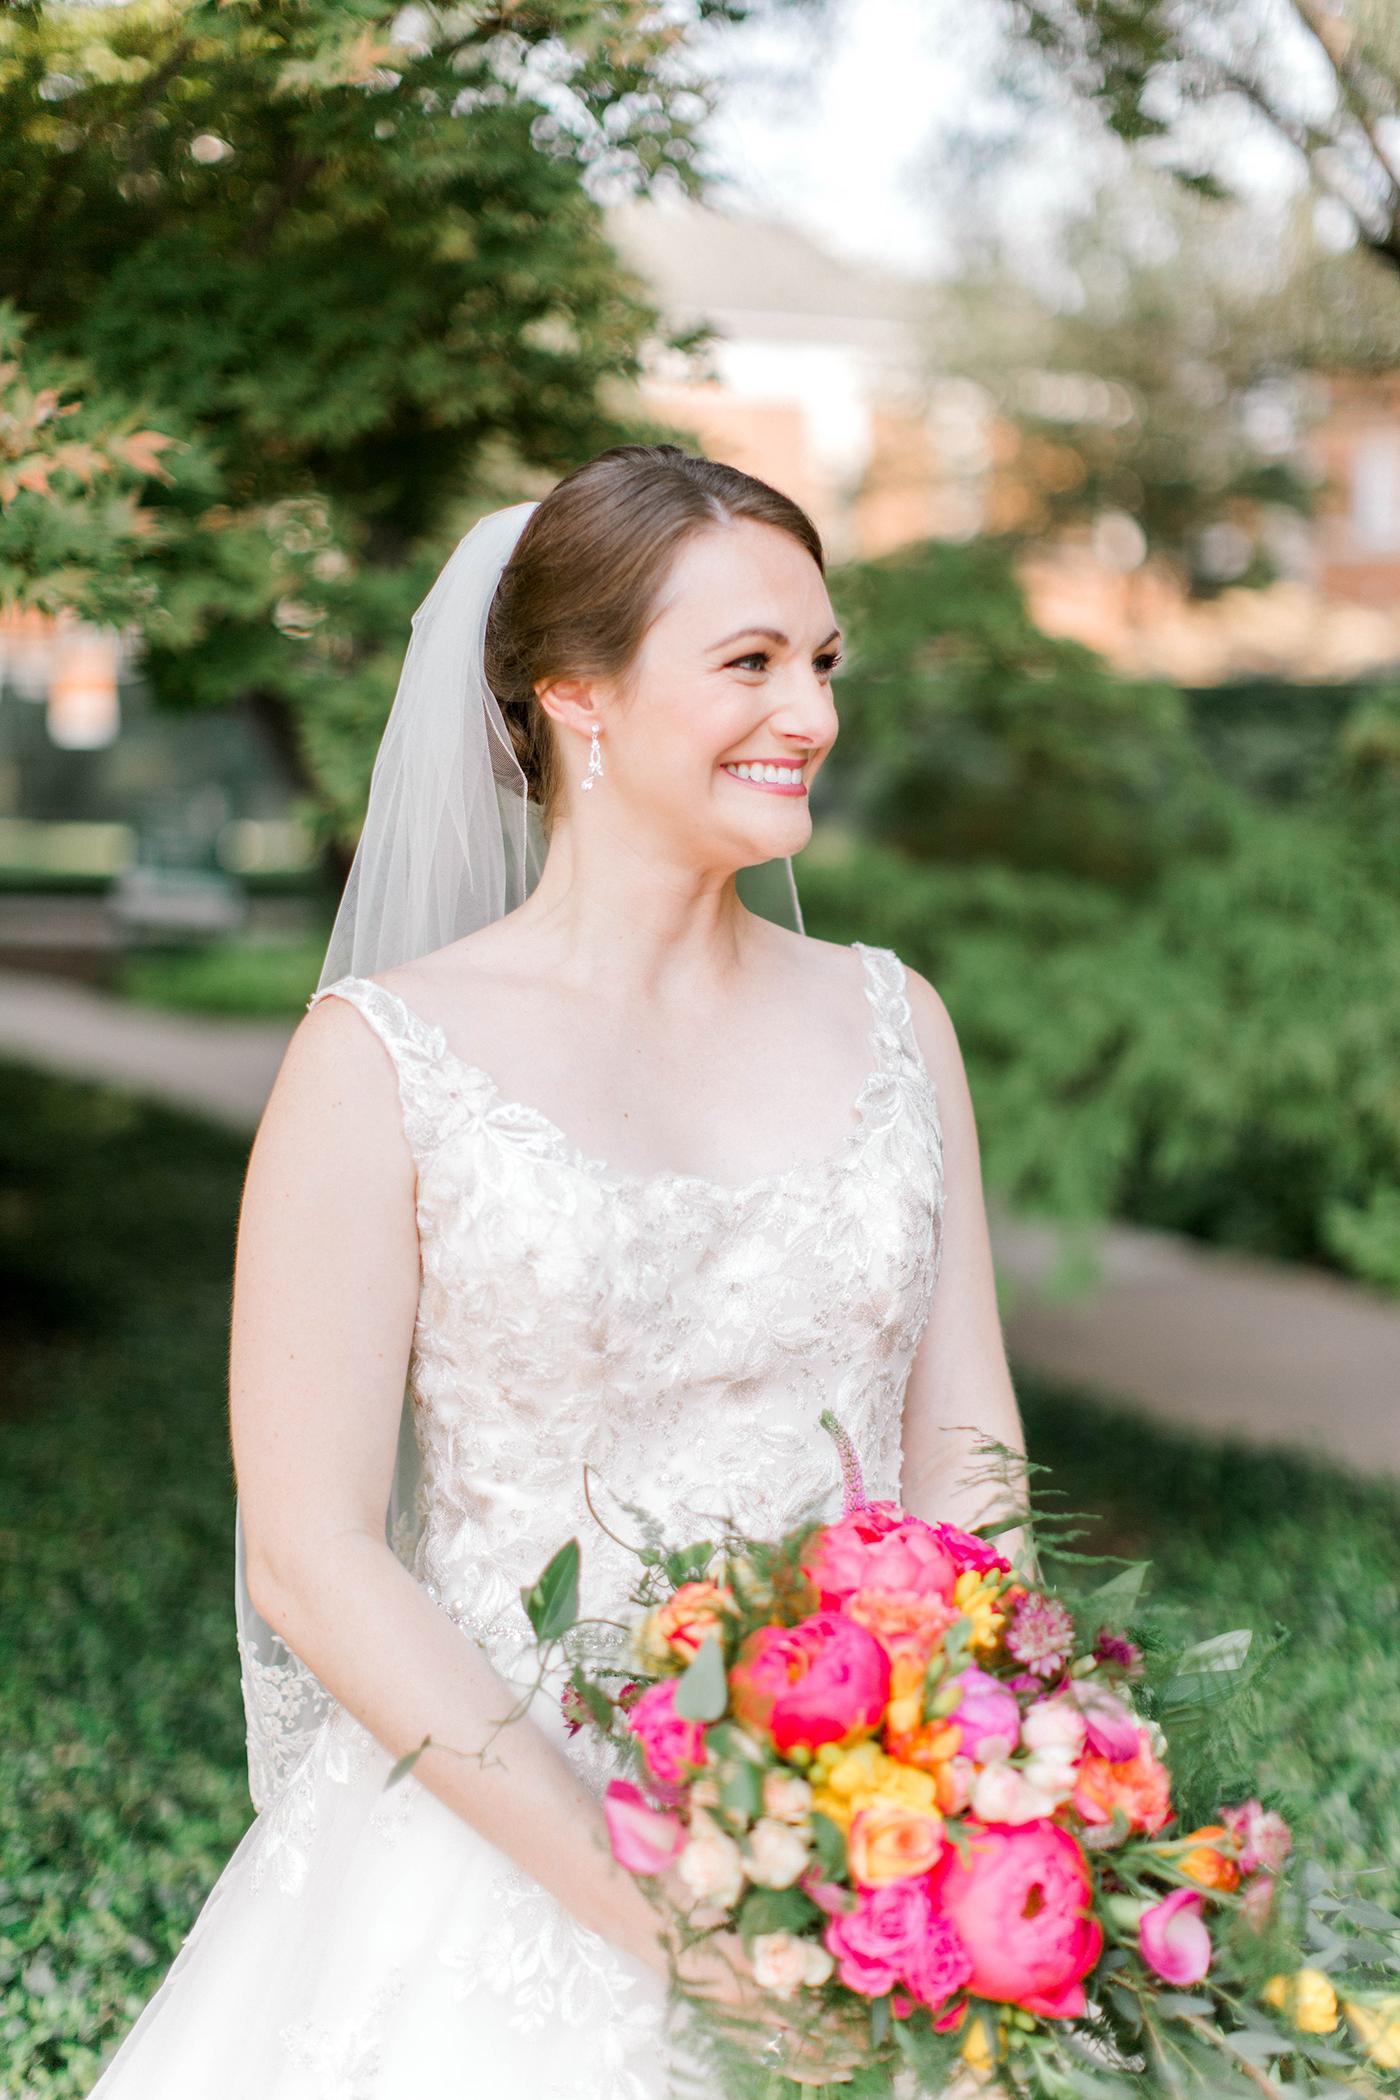 Dallas TX Wedding Planner - Allday Events - Hall on Dragon Wedding - 00061.jpg